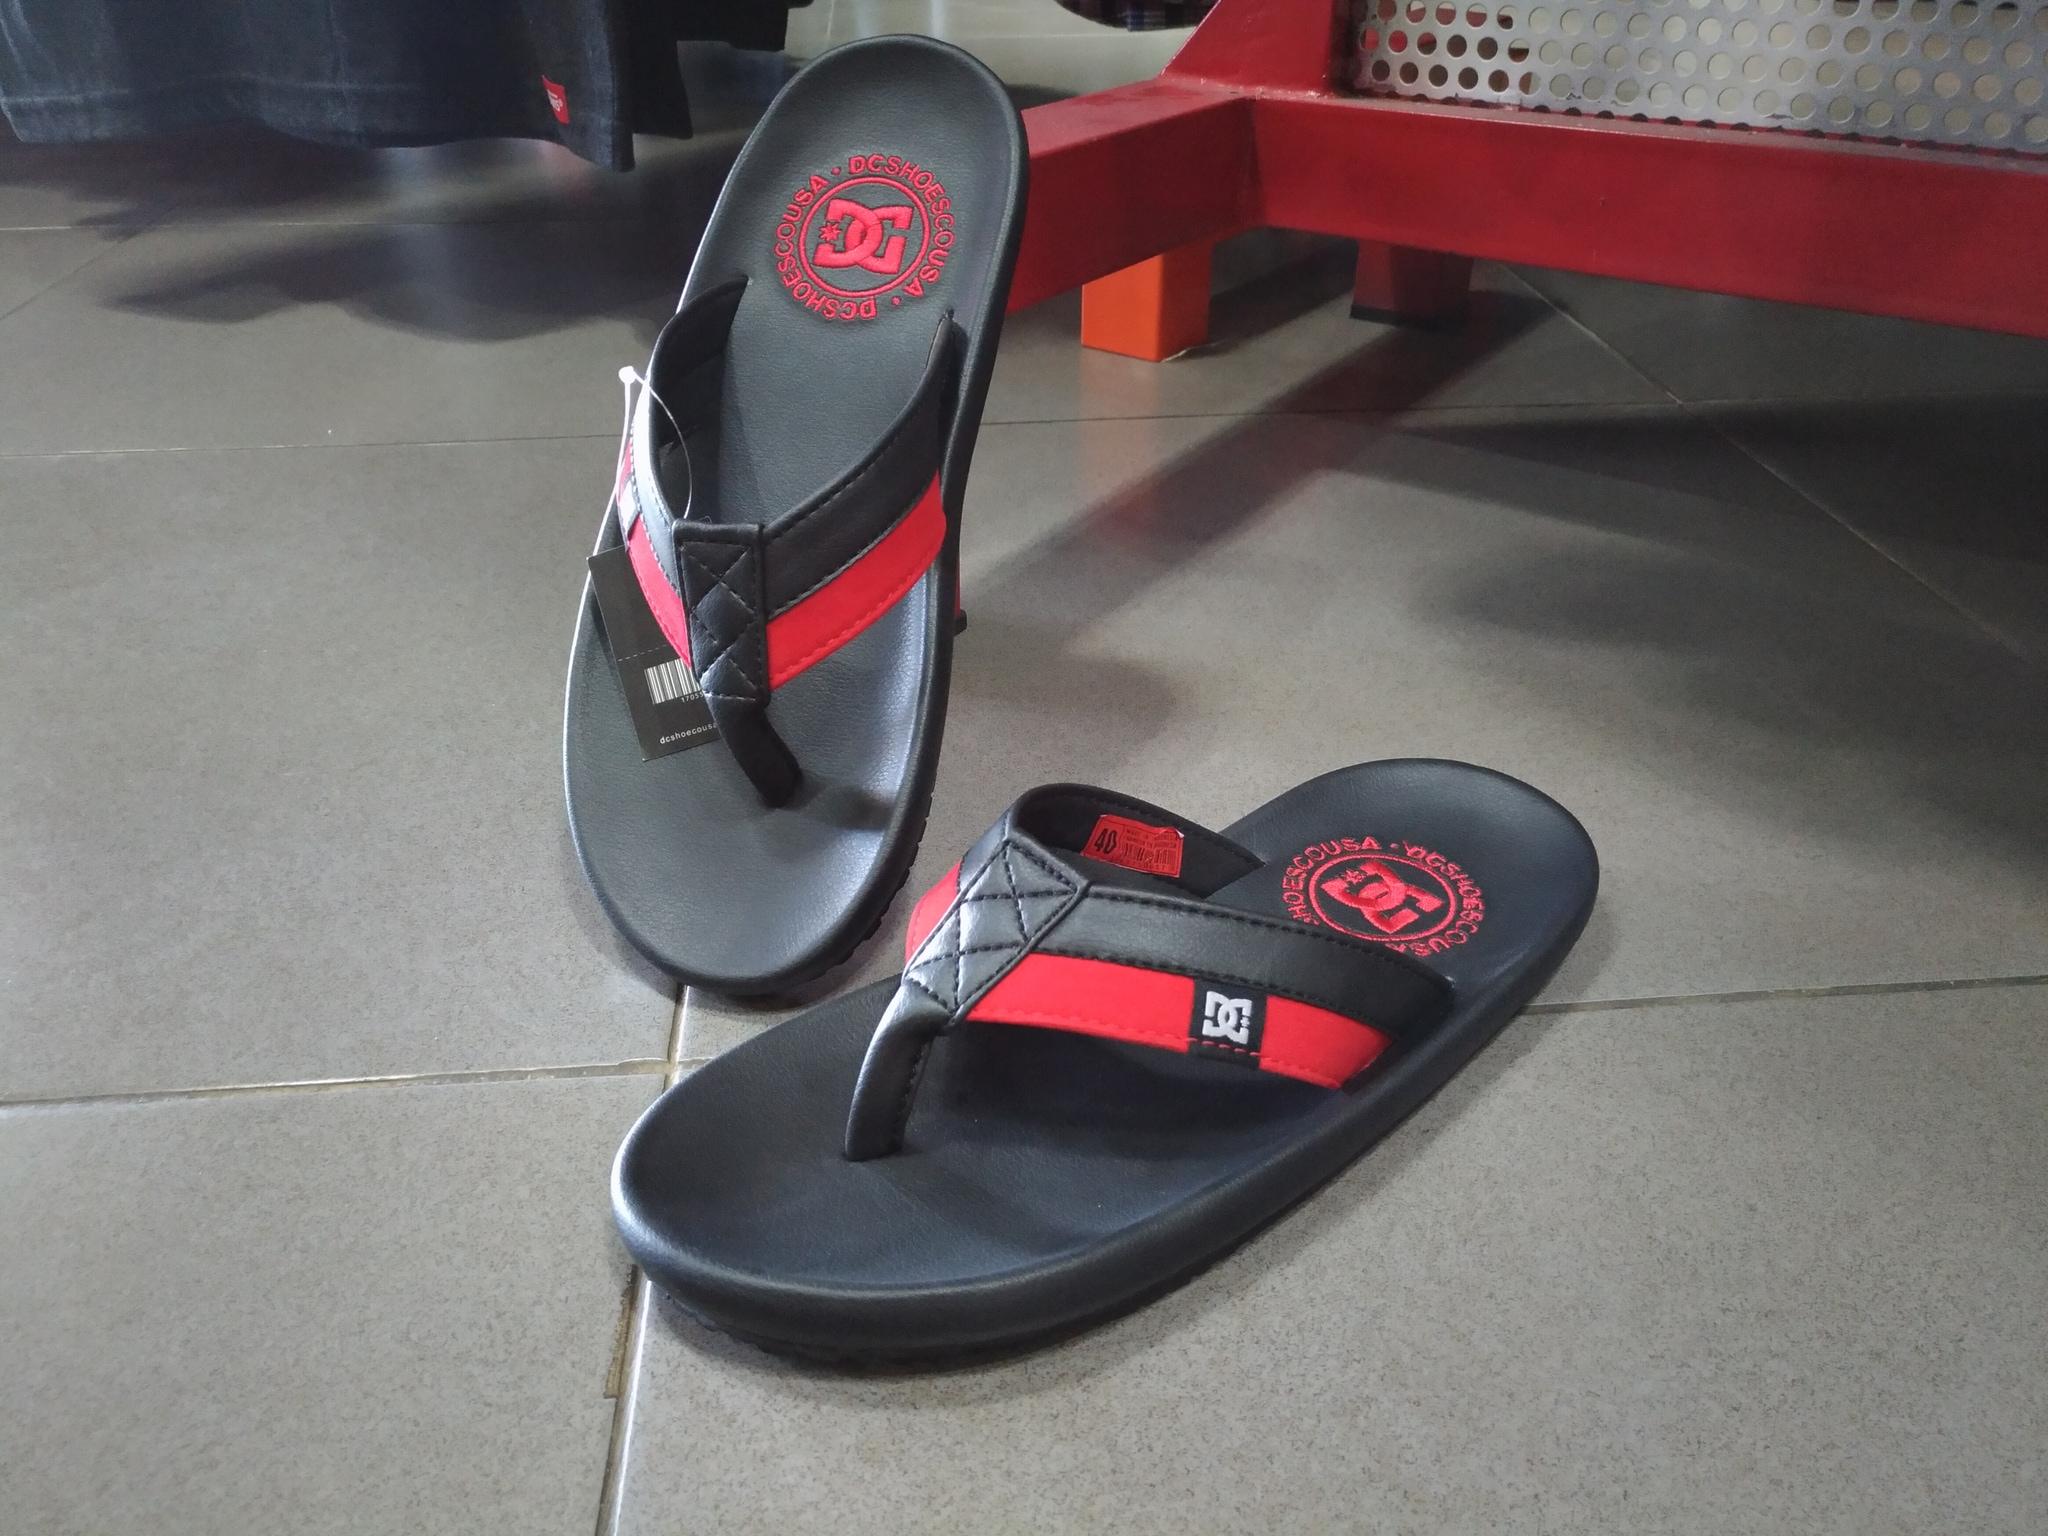 sandal dc sandal murah sandal surfing sandal pria sandal pria terbaru ... bb549497e3